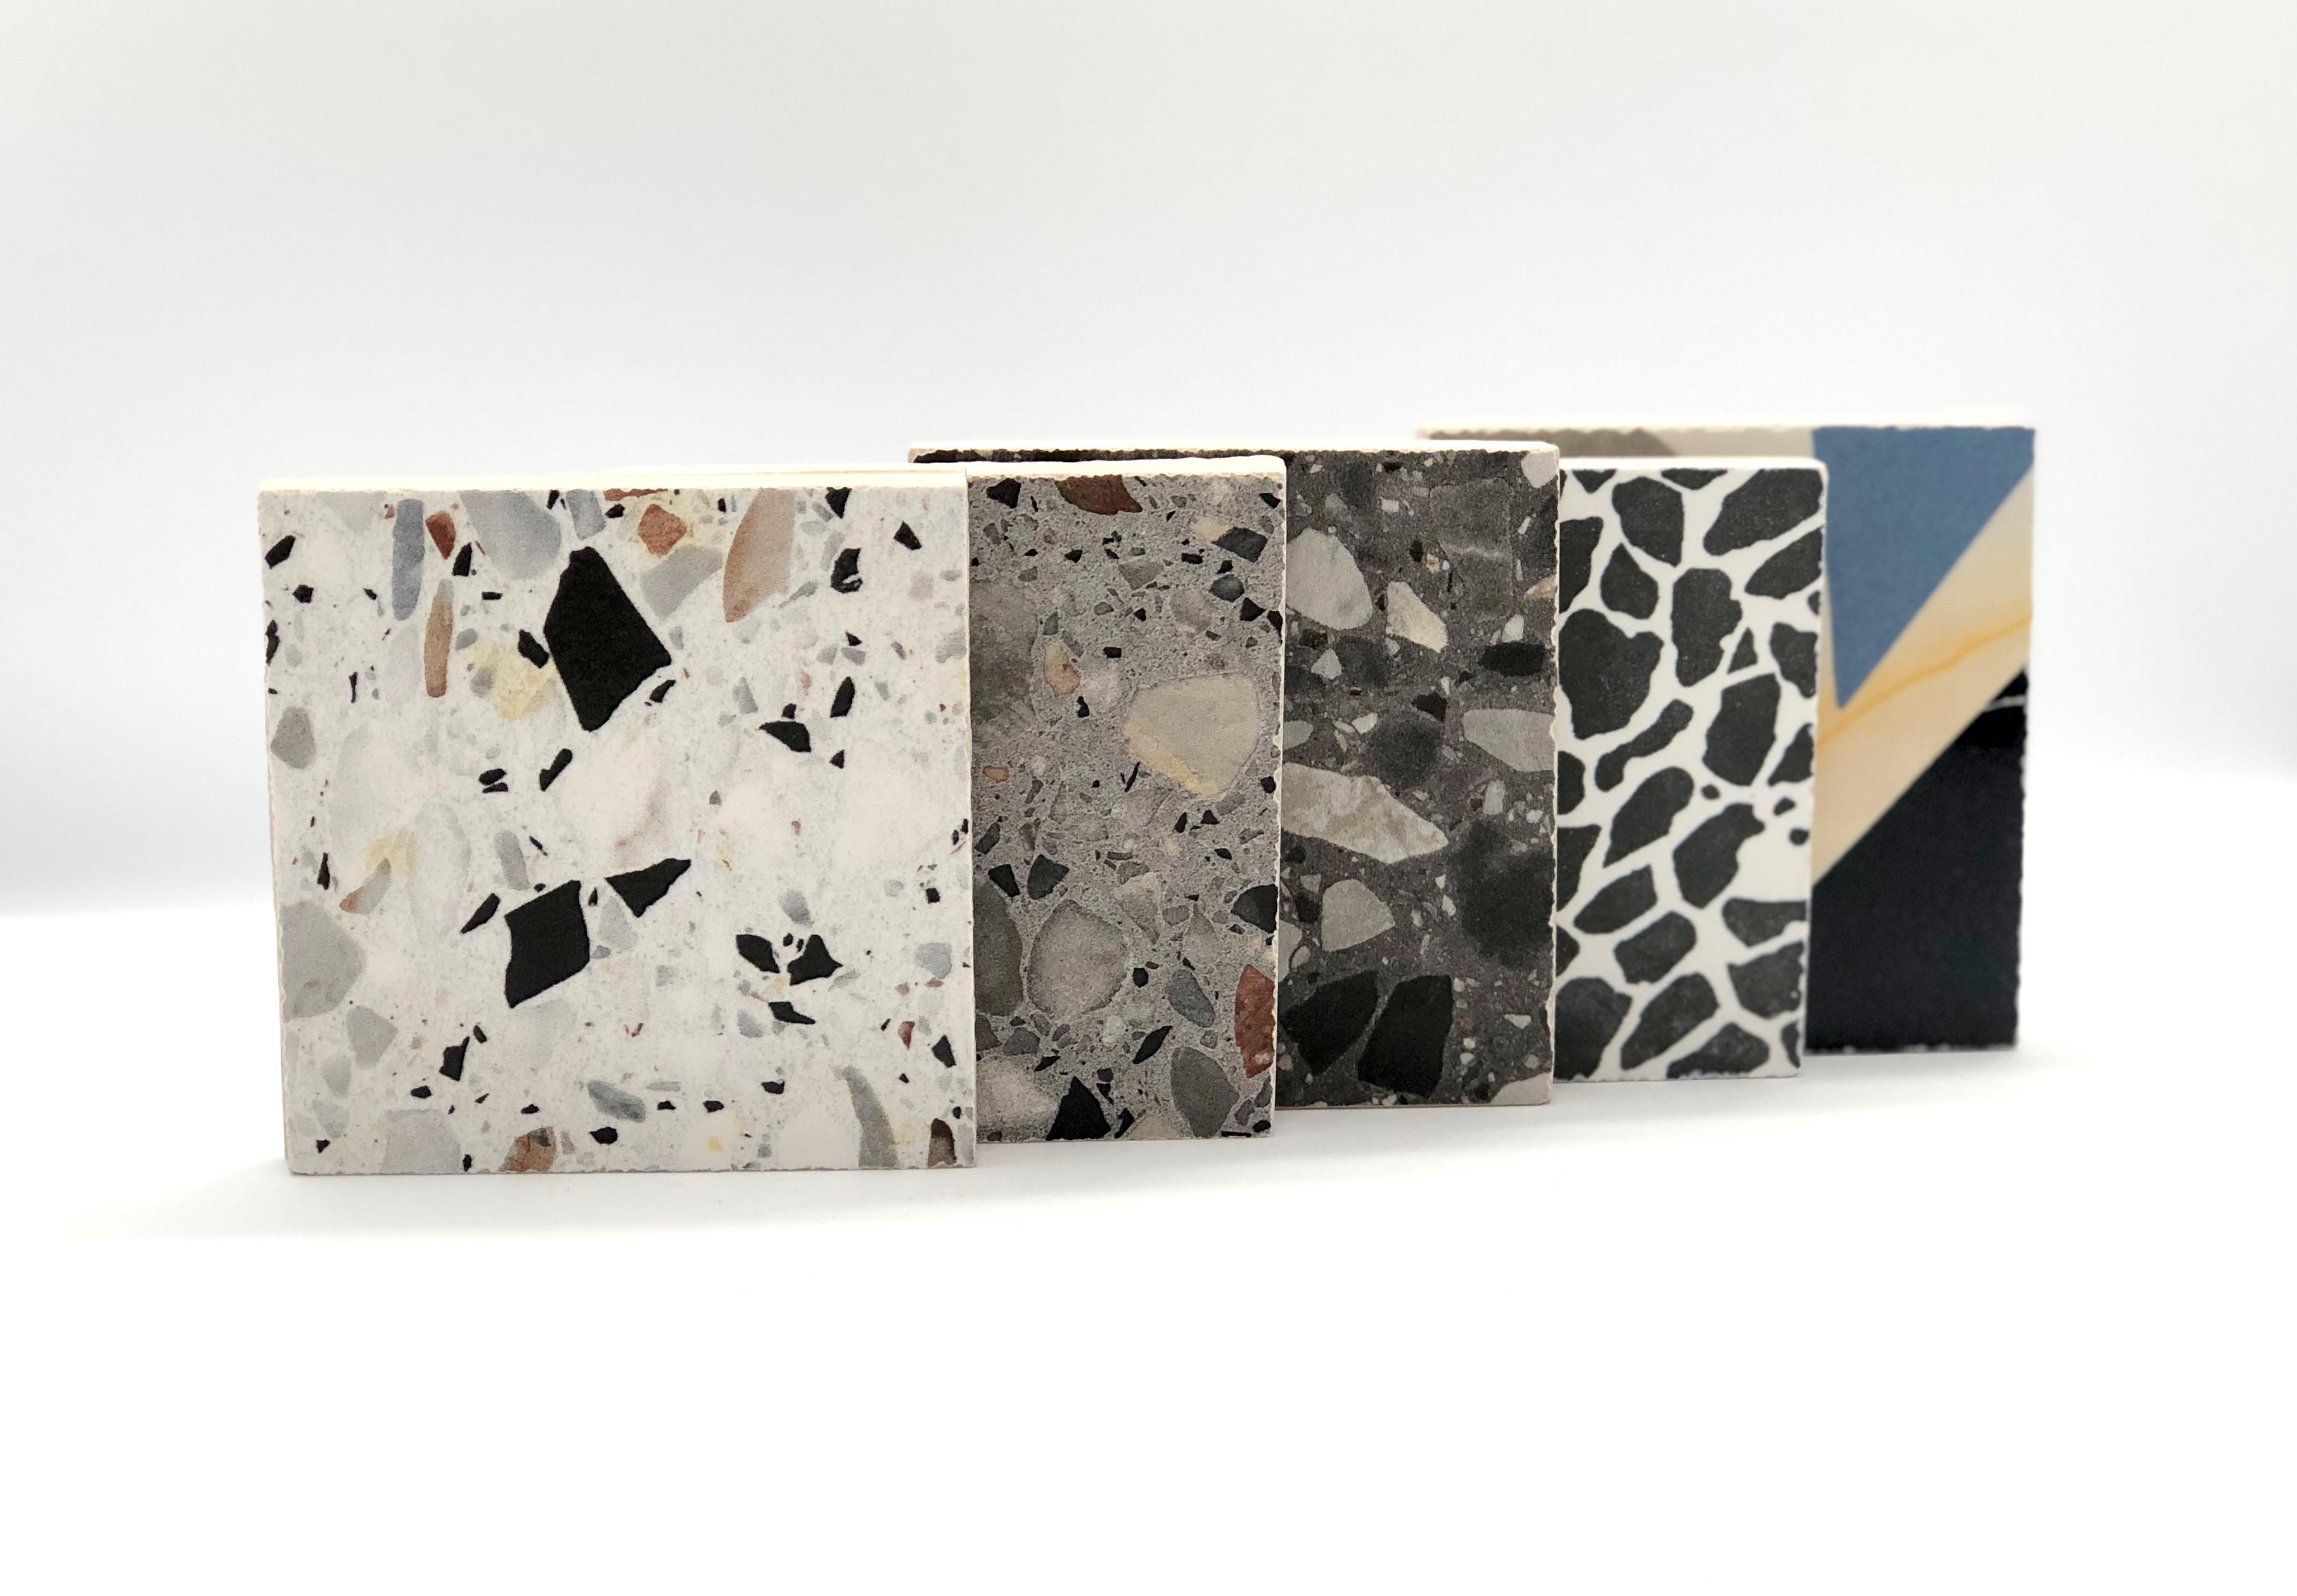 Porcelain Meets Terrazzo In Revamped Range Diespeker Co